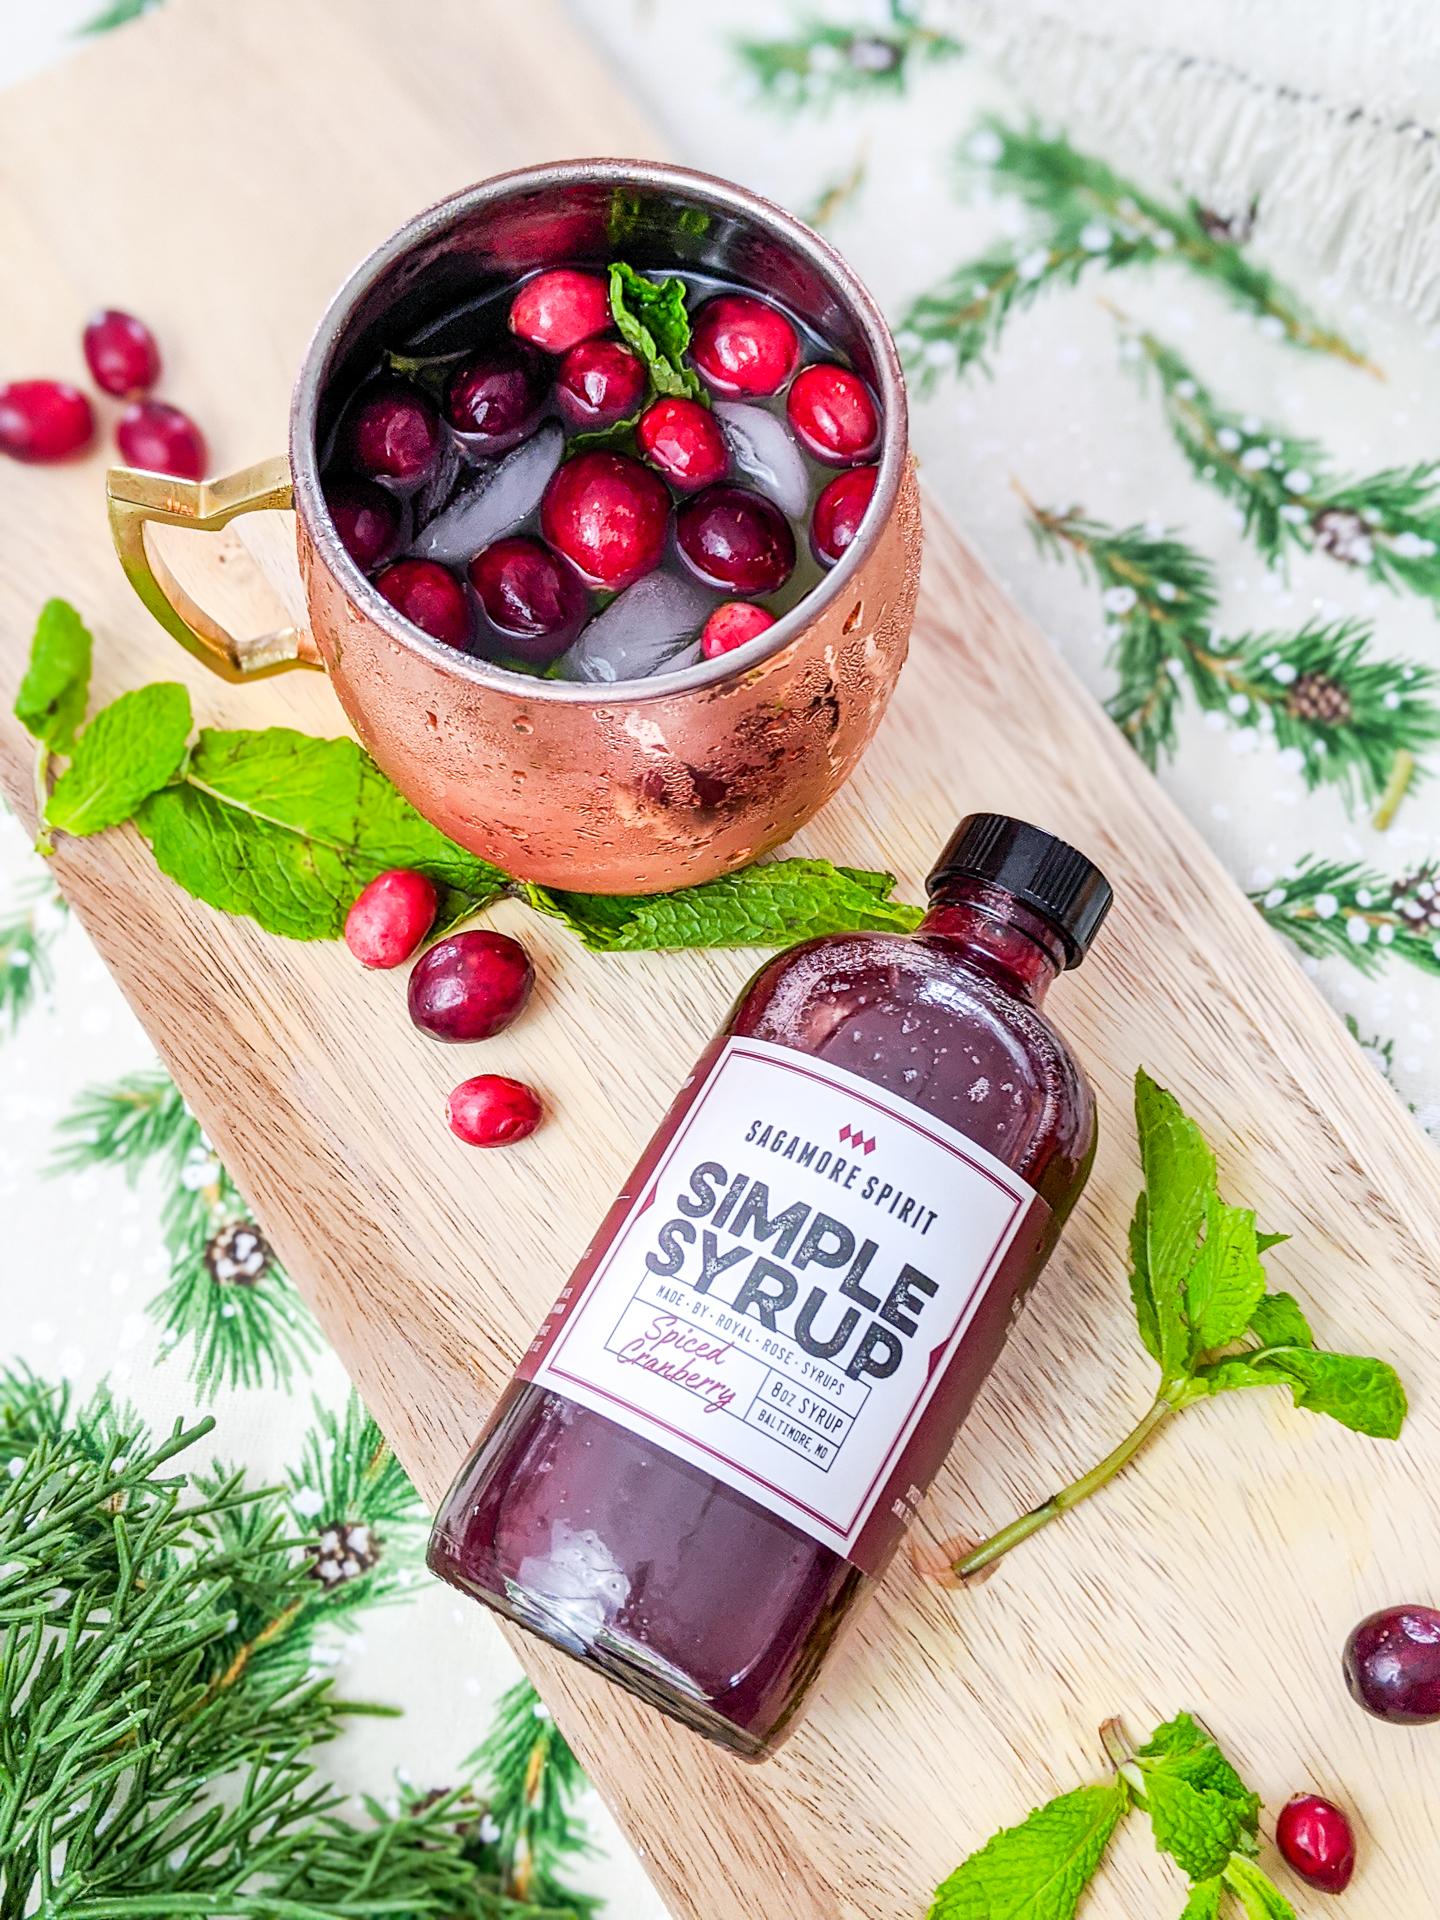 Sagamore Spirit cranberry simple syrup